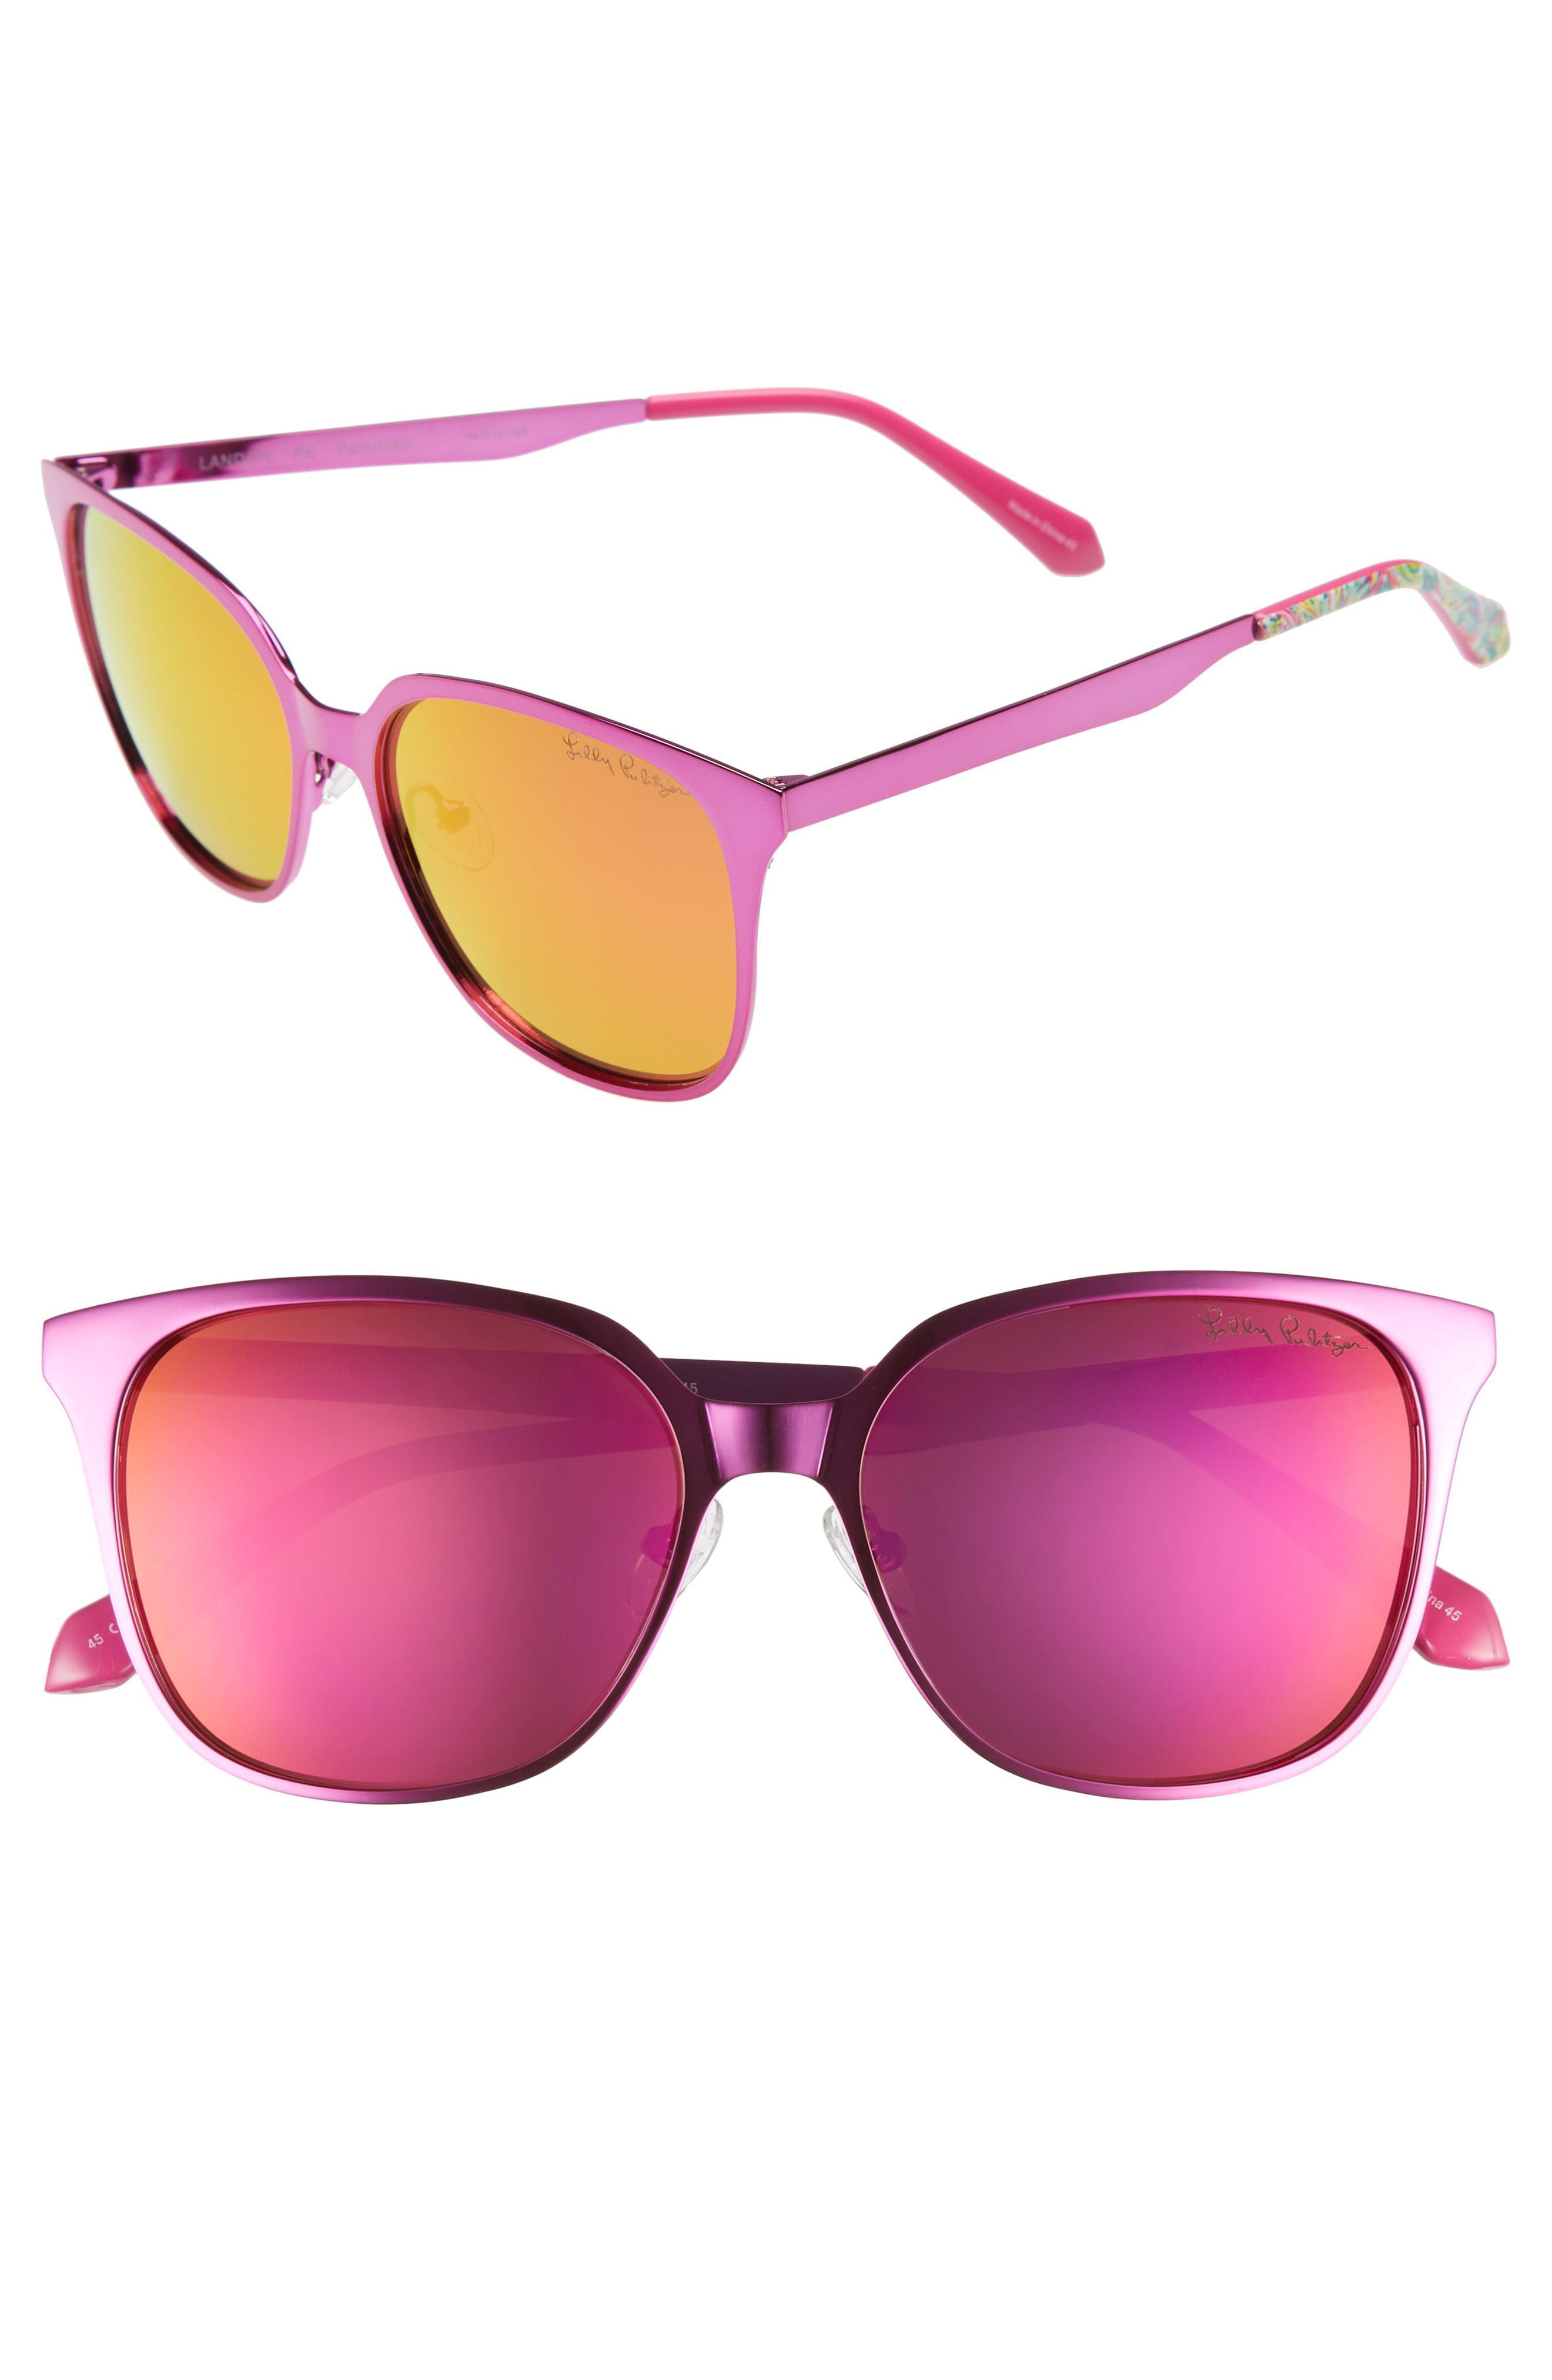 0b0f521cc7 Lilly Pulitzer. Women s Lilly Pulitzer Landon 54mm Polarized Sunglasses -